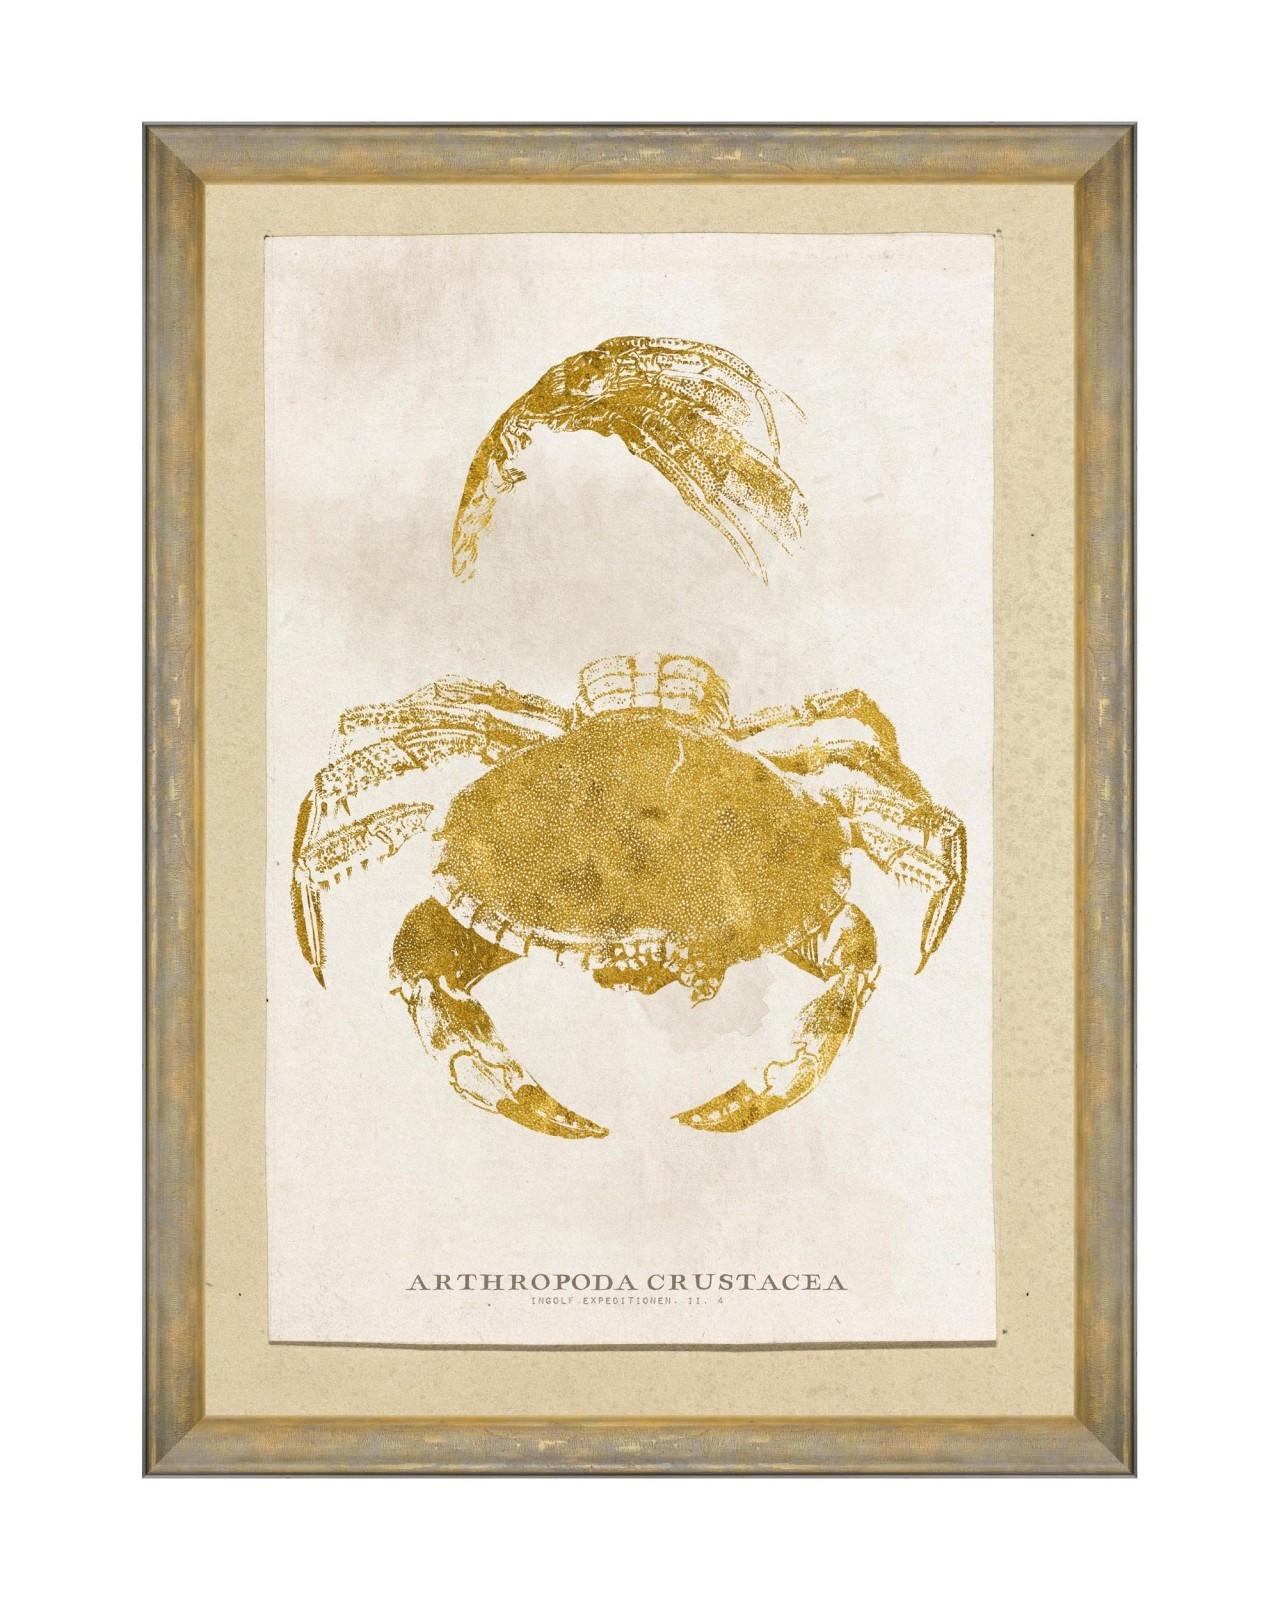 Tablou Framed Art Caribbean Sea Life - Arthropoda Crustacea, 50 x 70 cm imagine